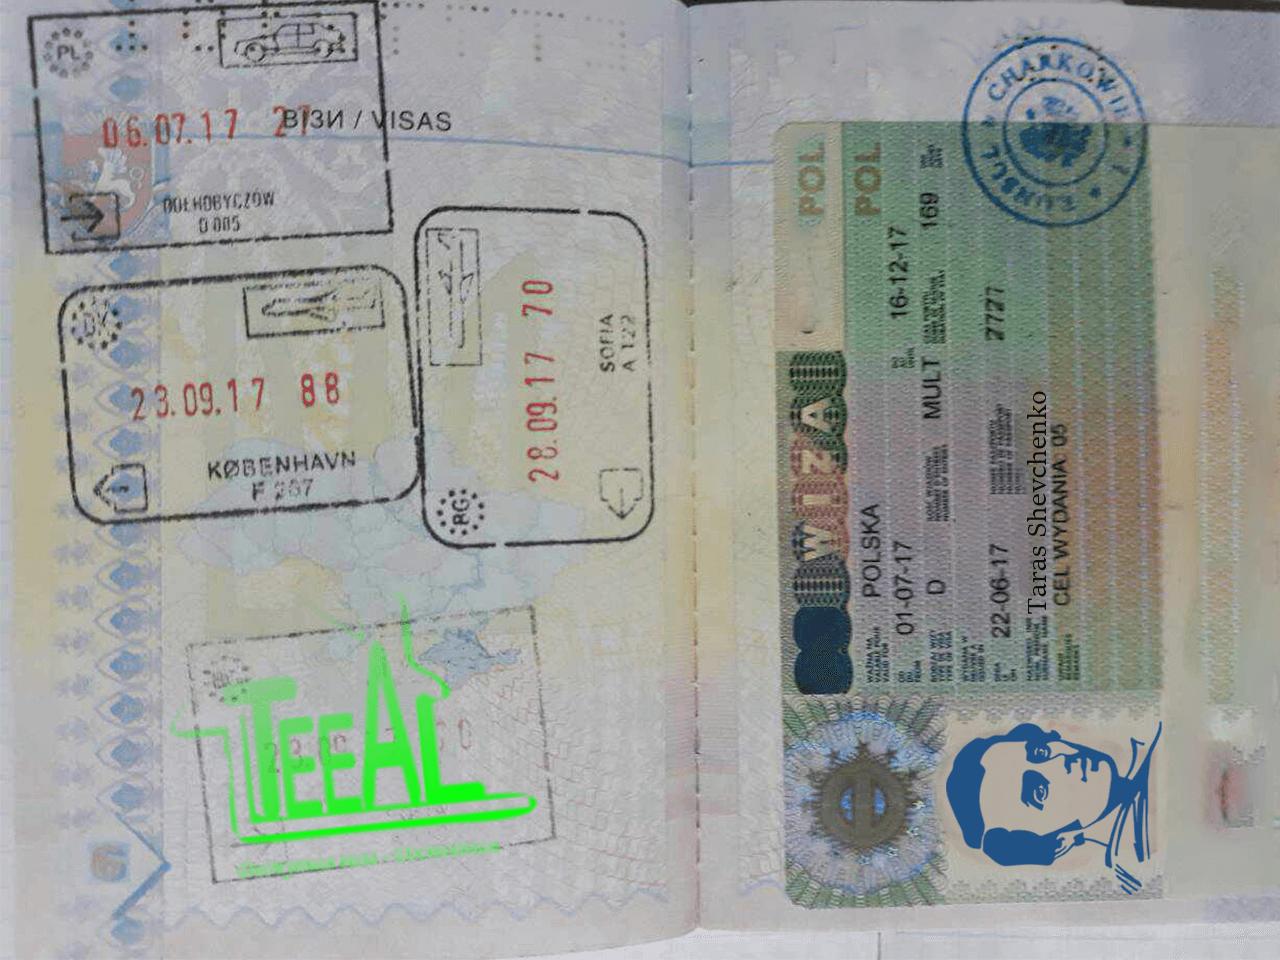 рабочая виза d05 teeal pl